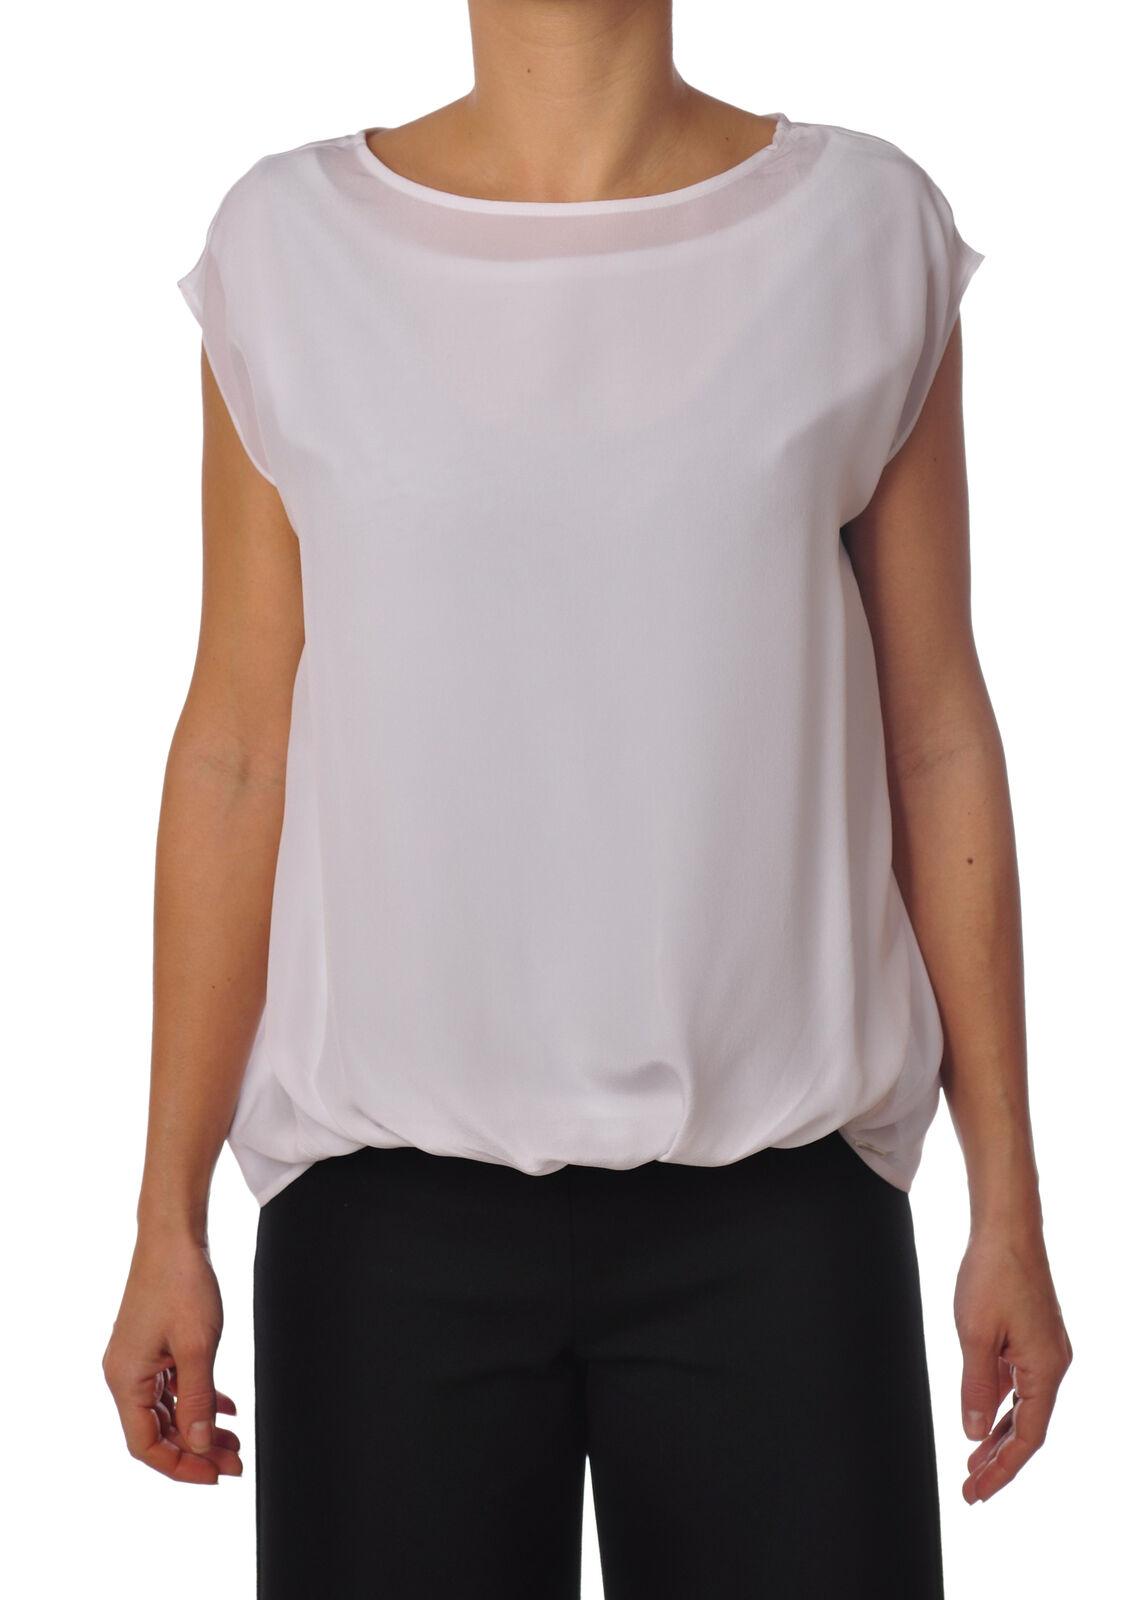 Woolrich - Shirts-Blouses - Woman - White - 4956510C192138